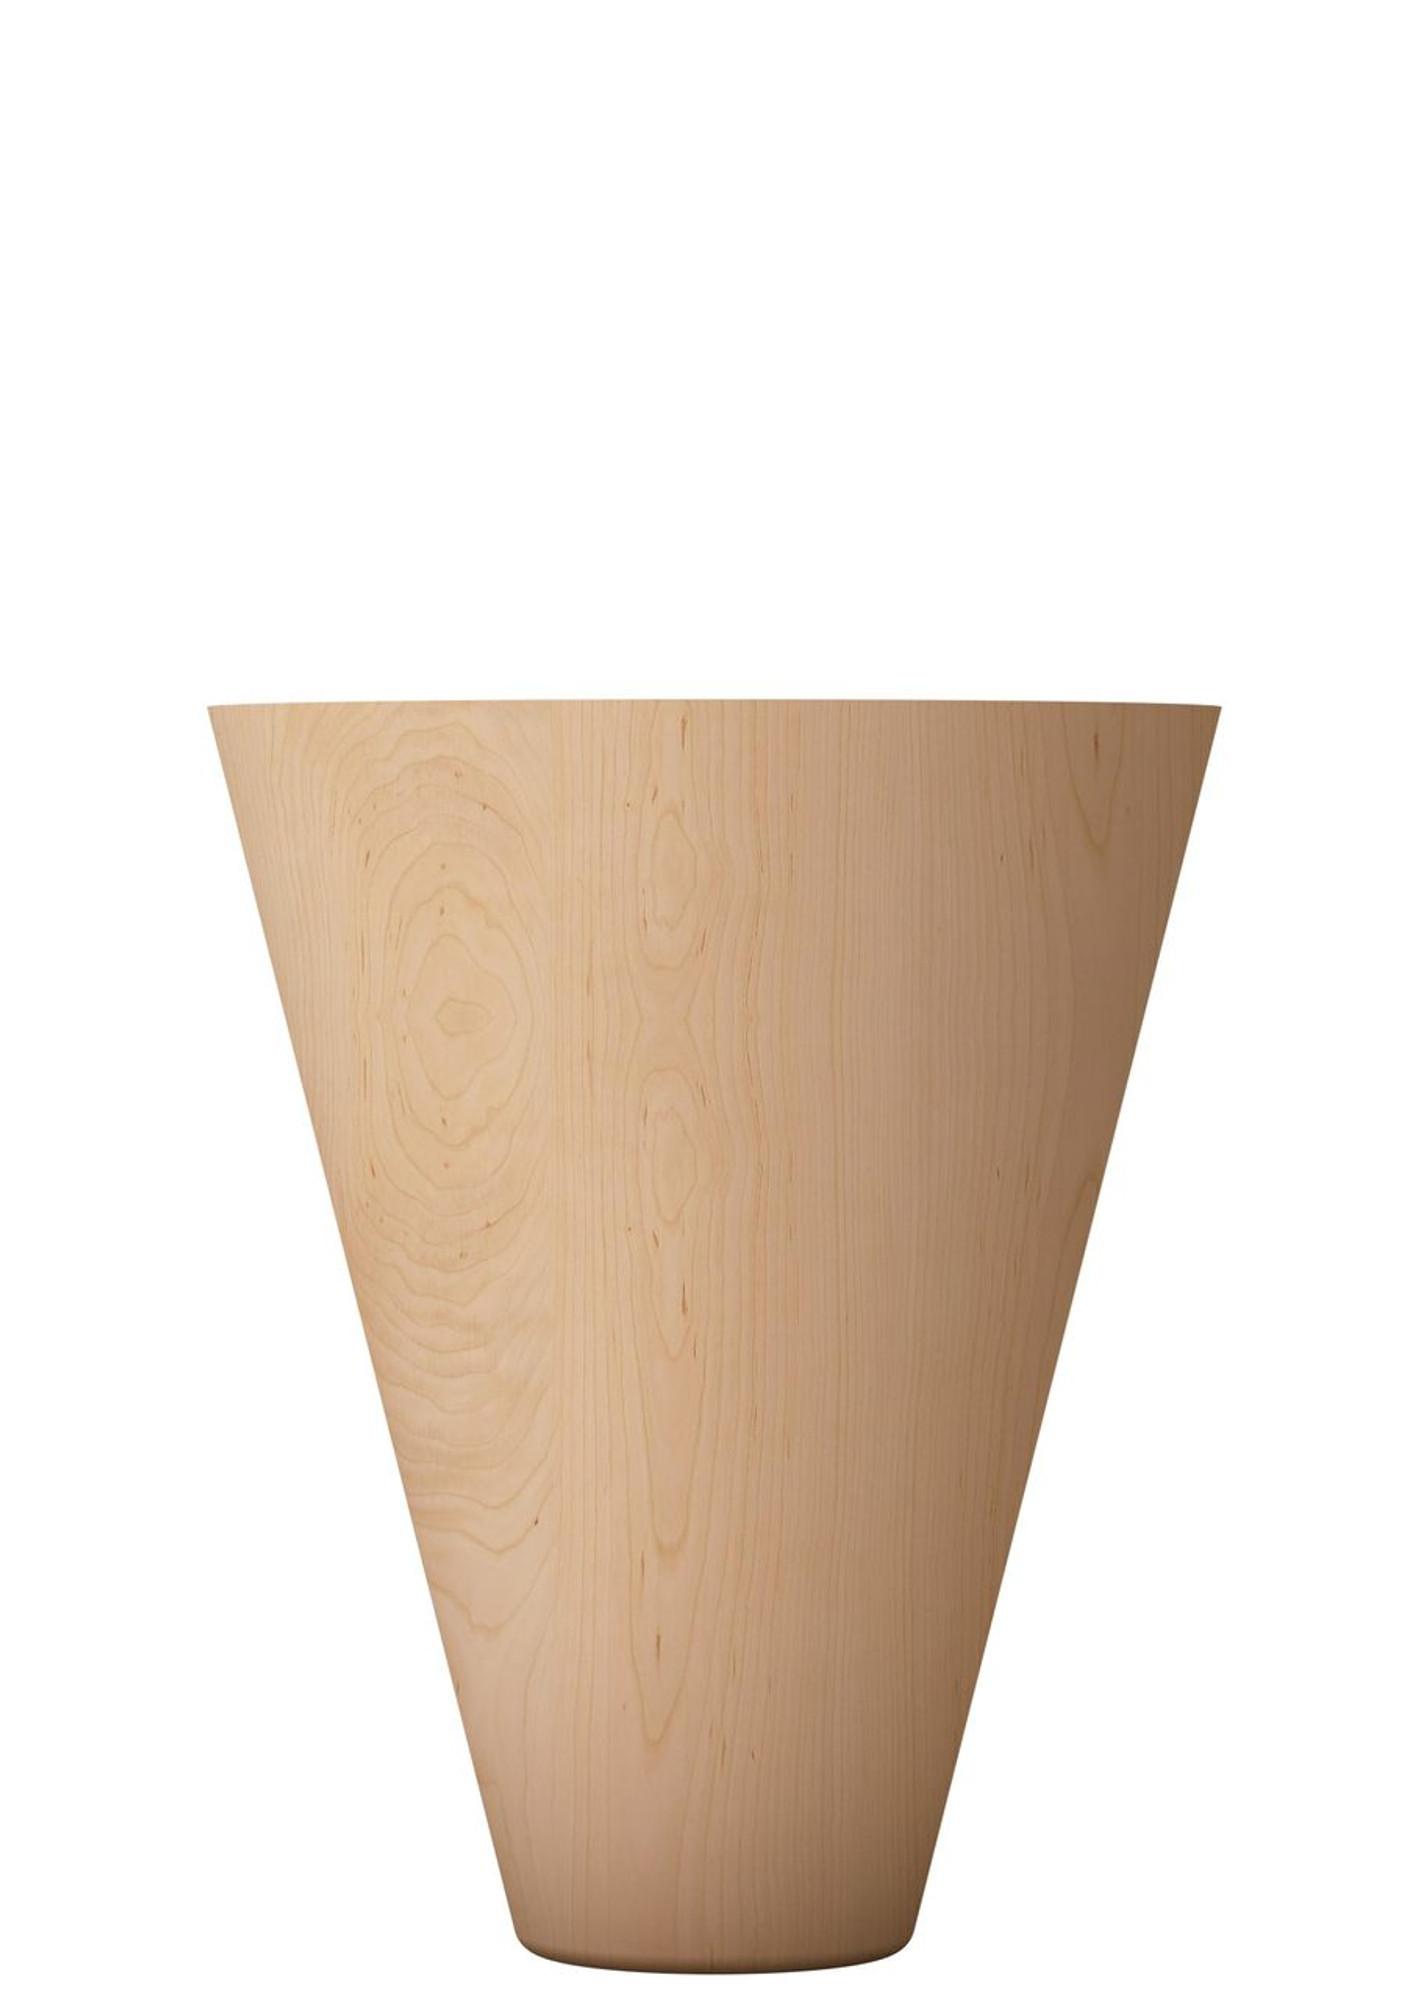 ^ Shop for Mid-entury Modern Furniture Feet - ableLegs.com